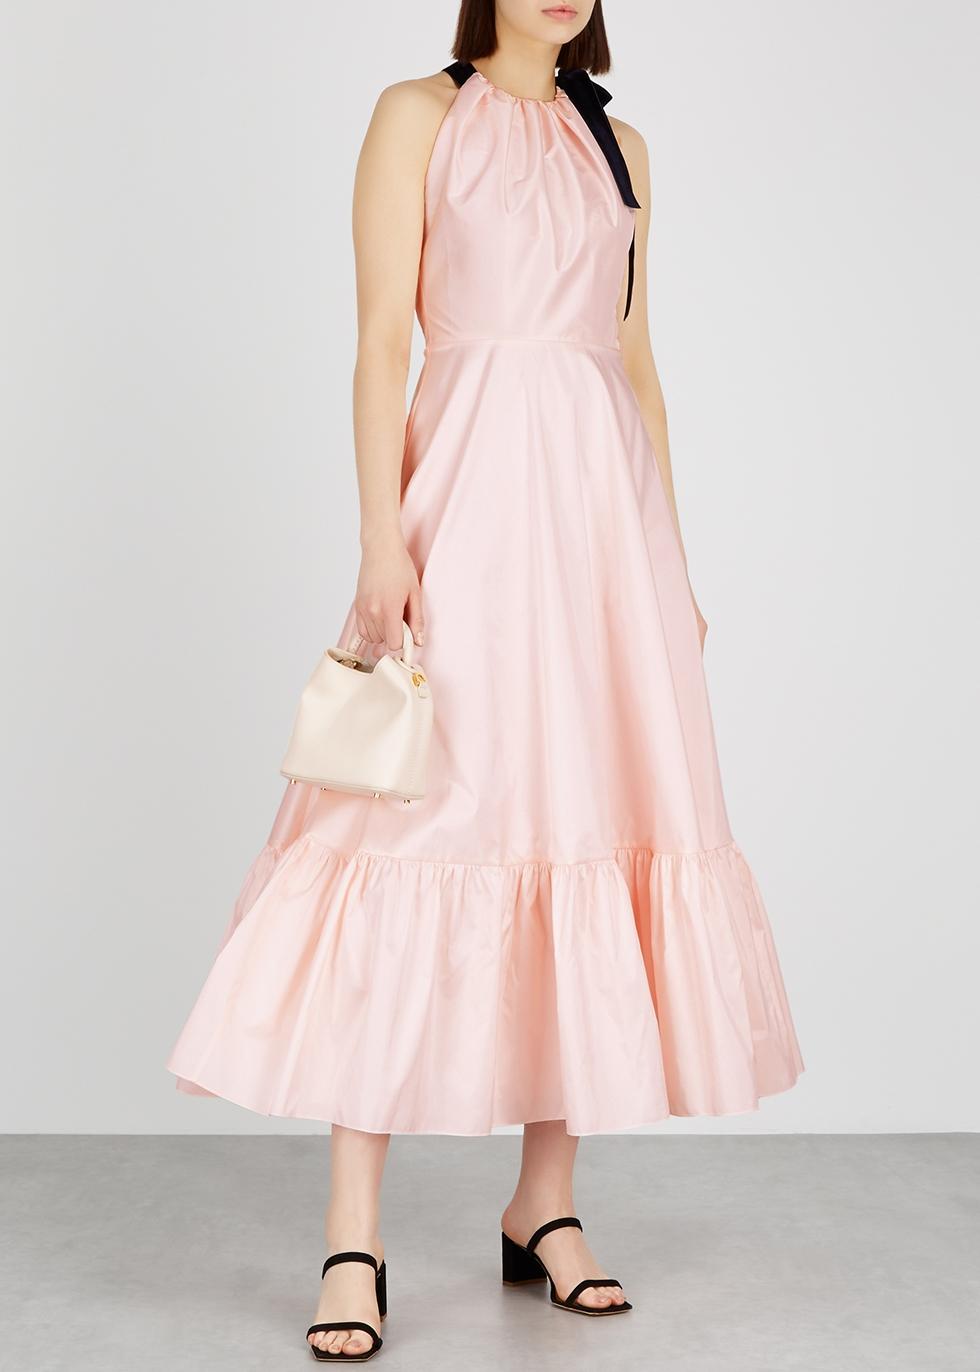 Designer Dresses   Designer Gowns - Harvey Nichols 562bda9eb